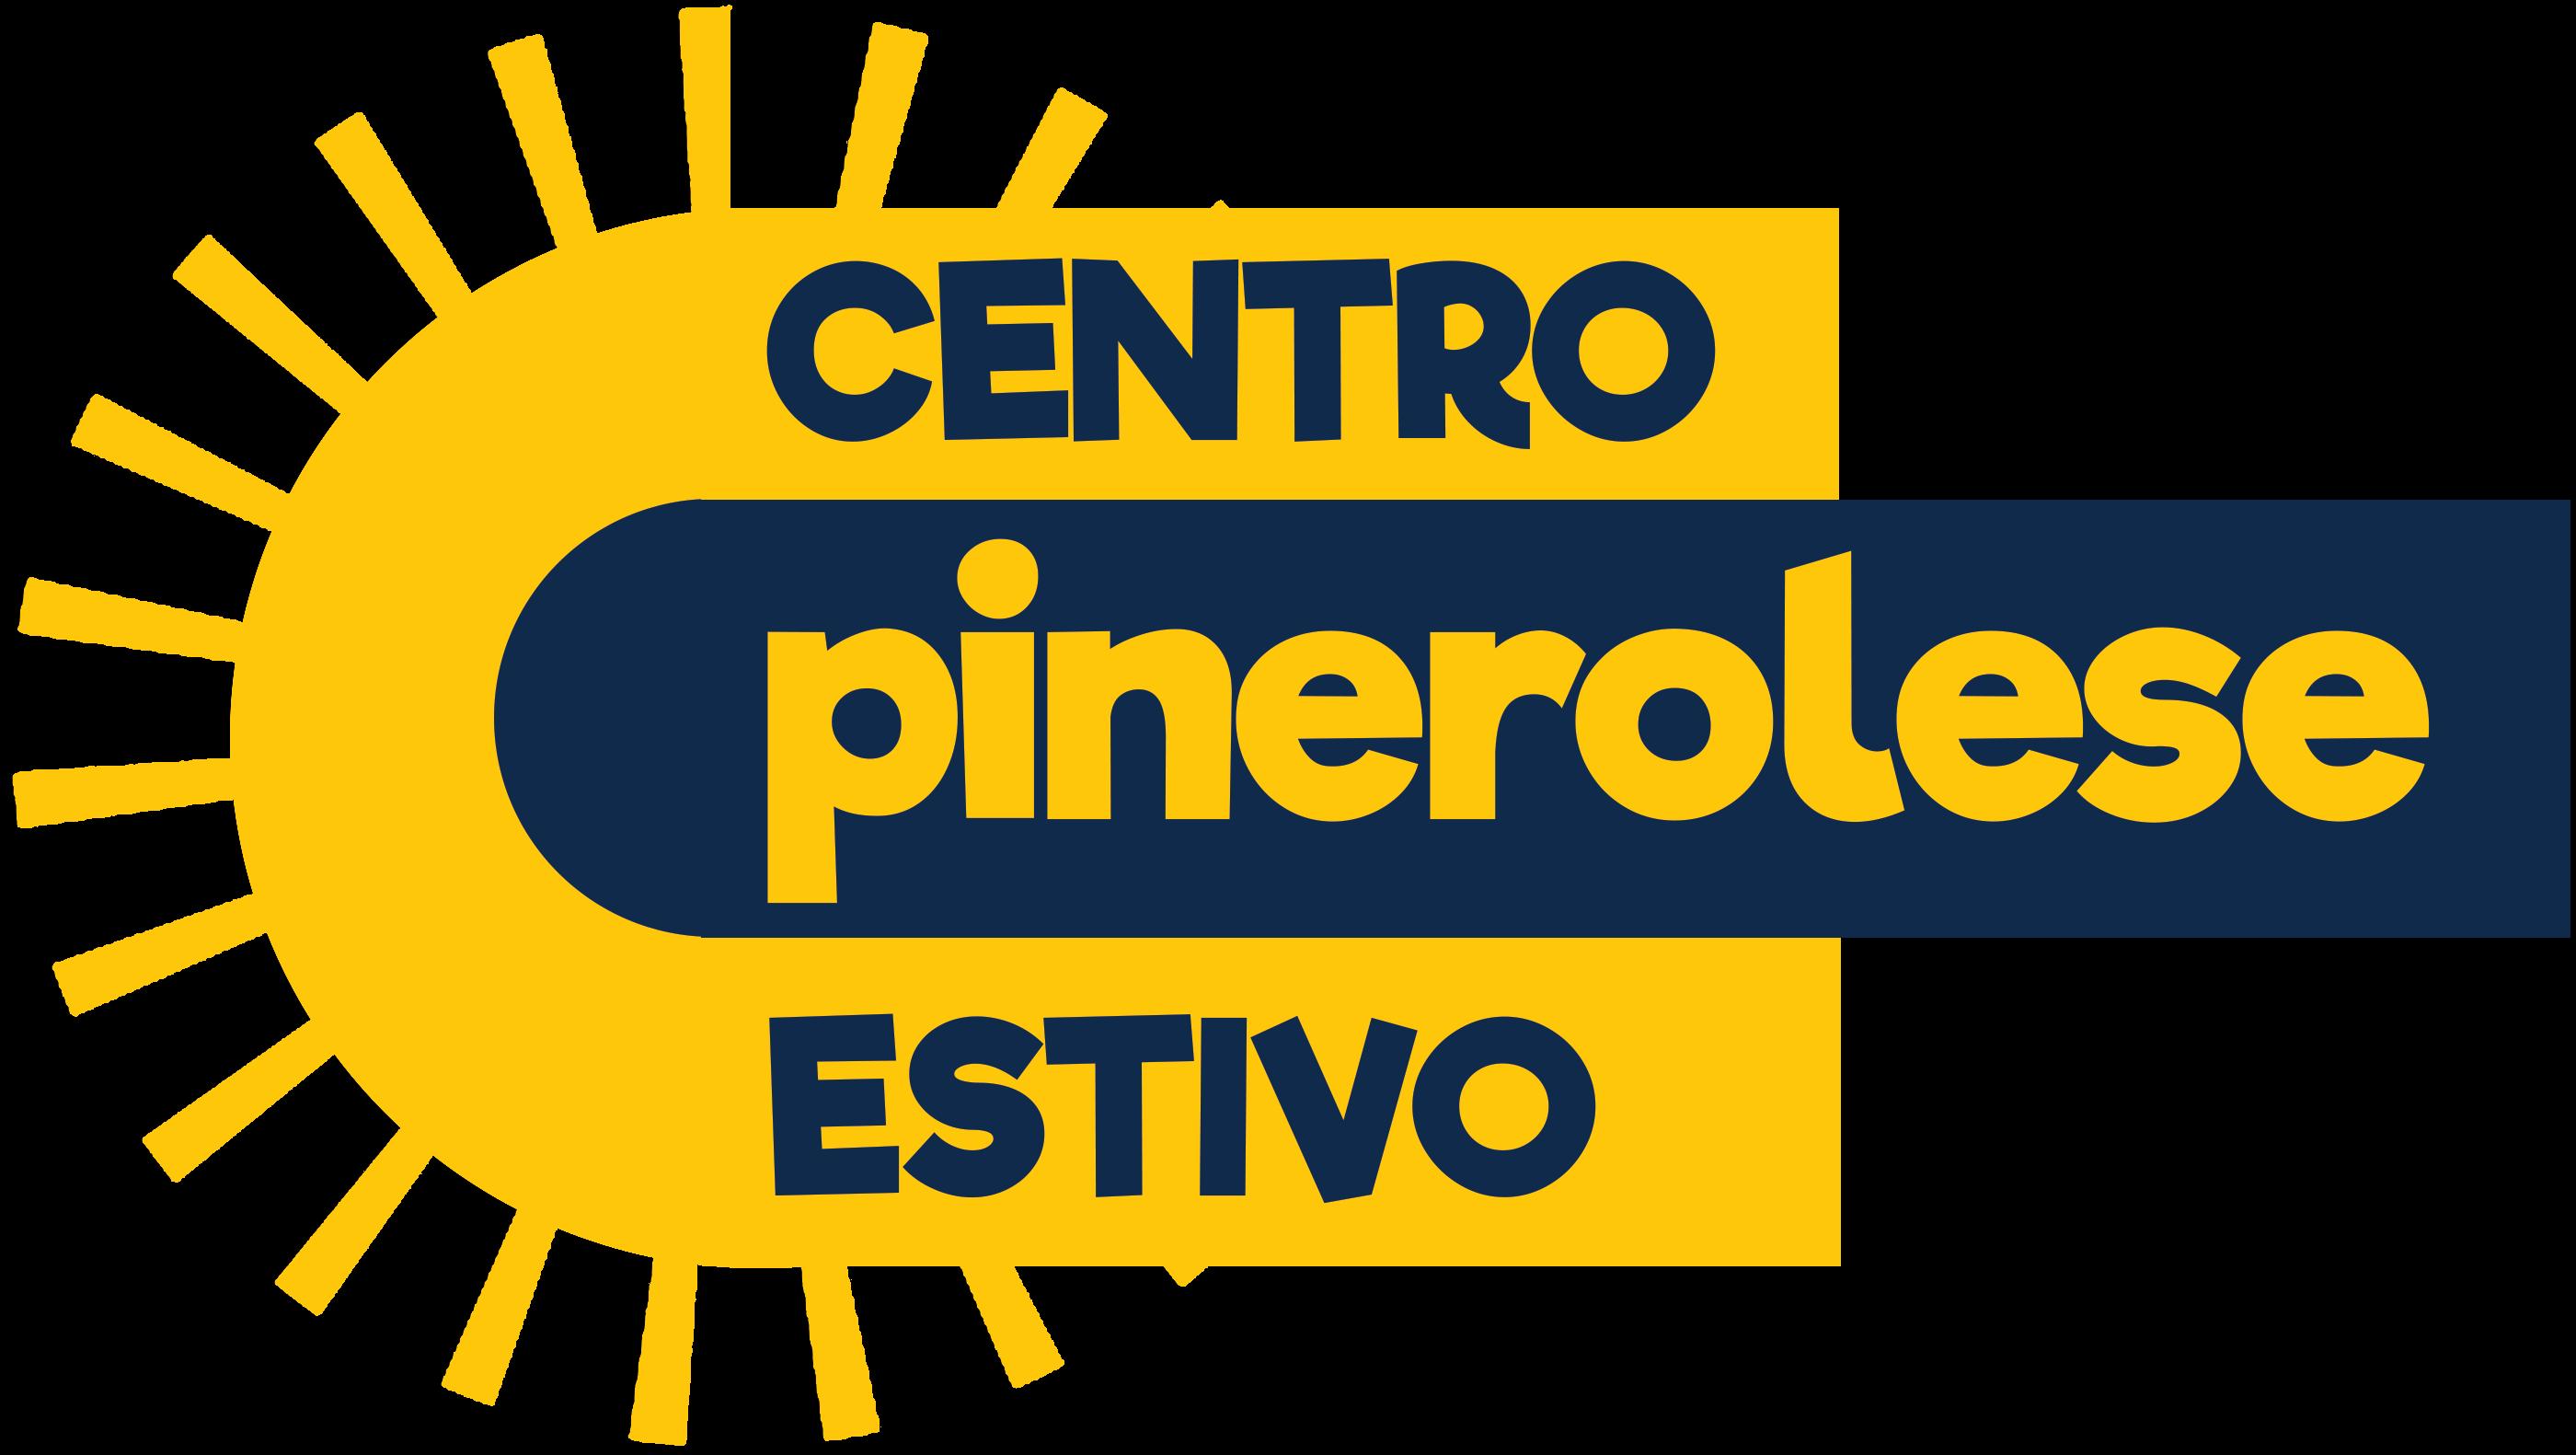 Centro Estivo Pinerolese 2020